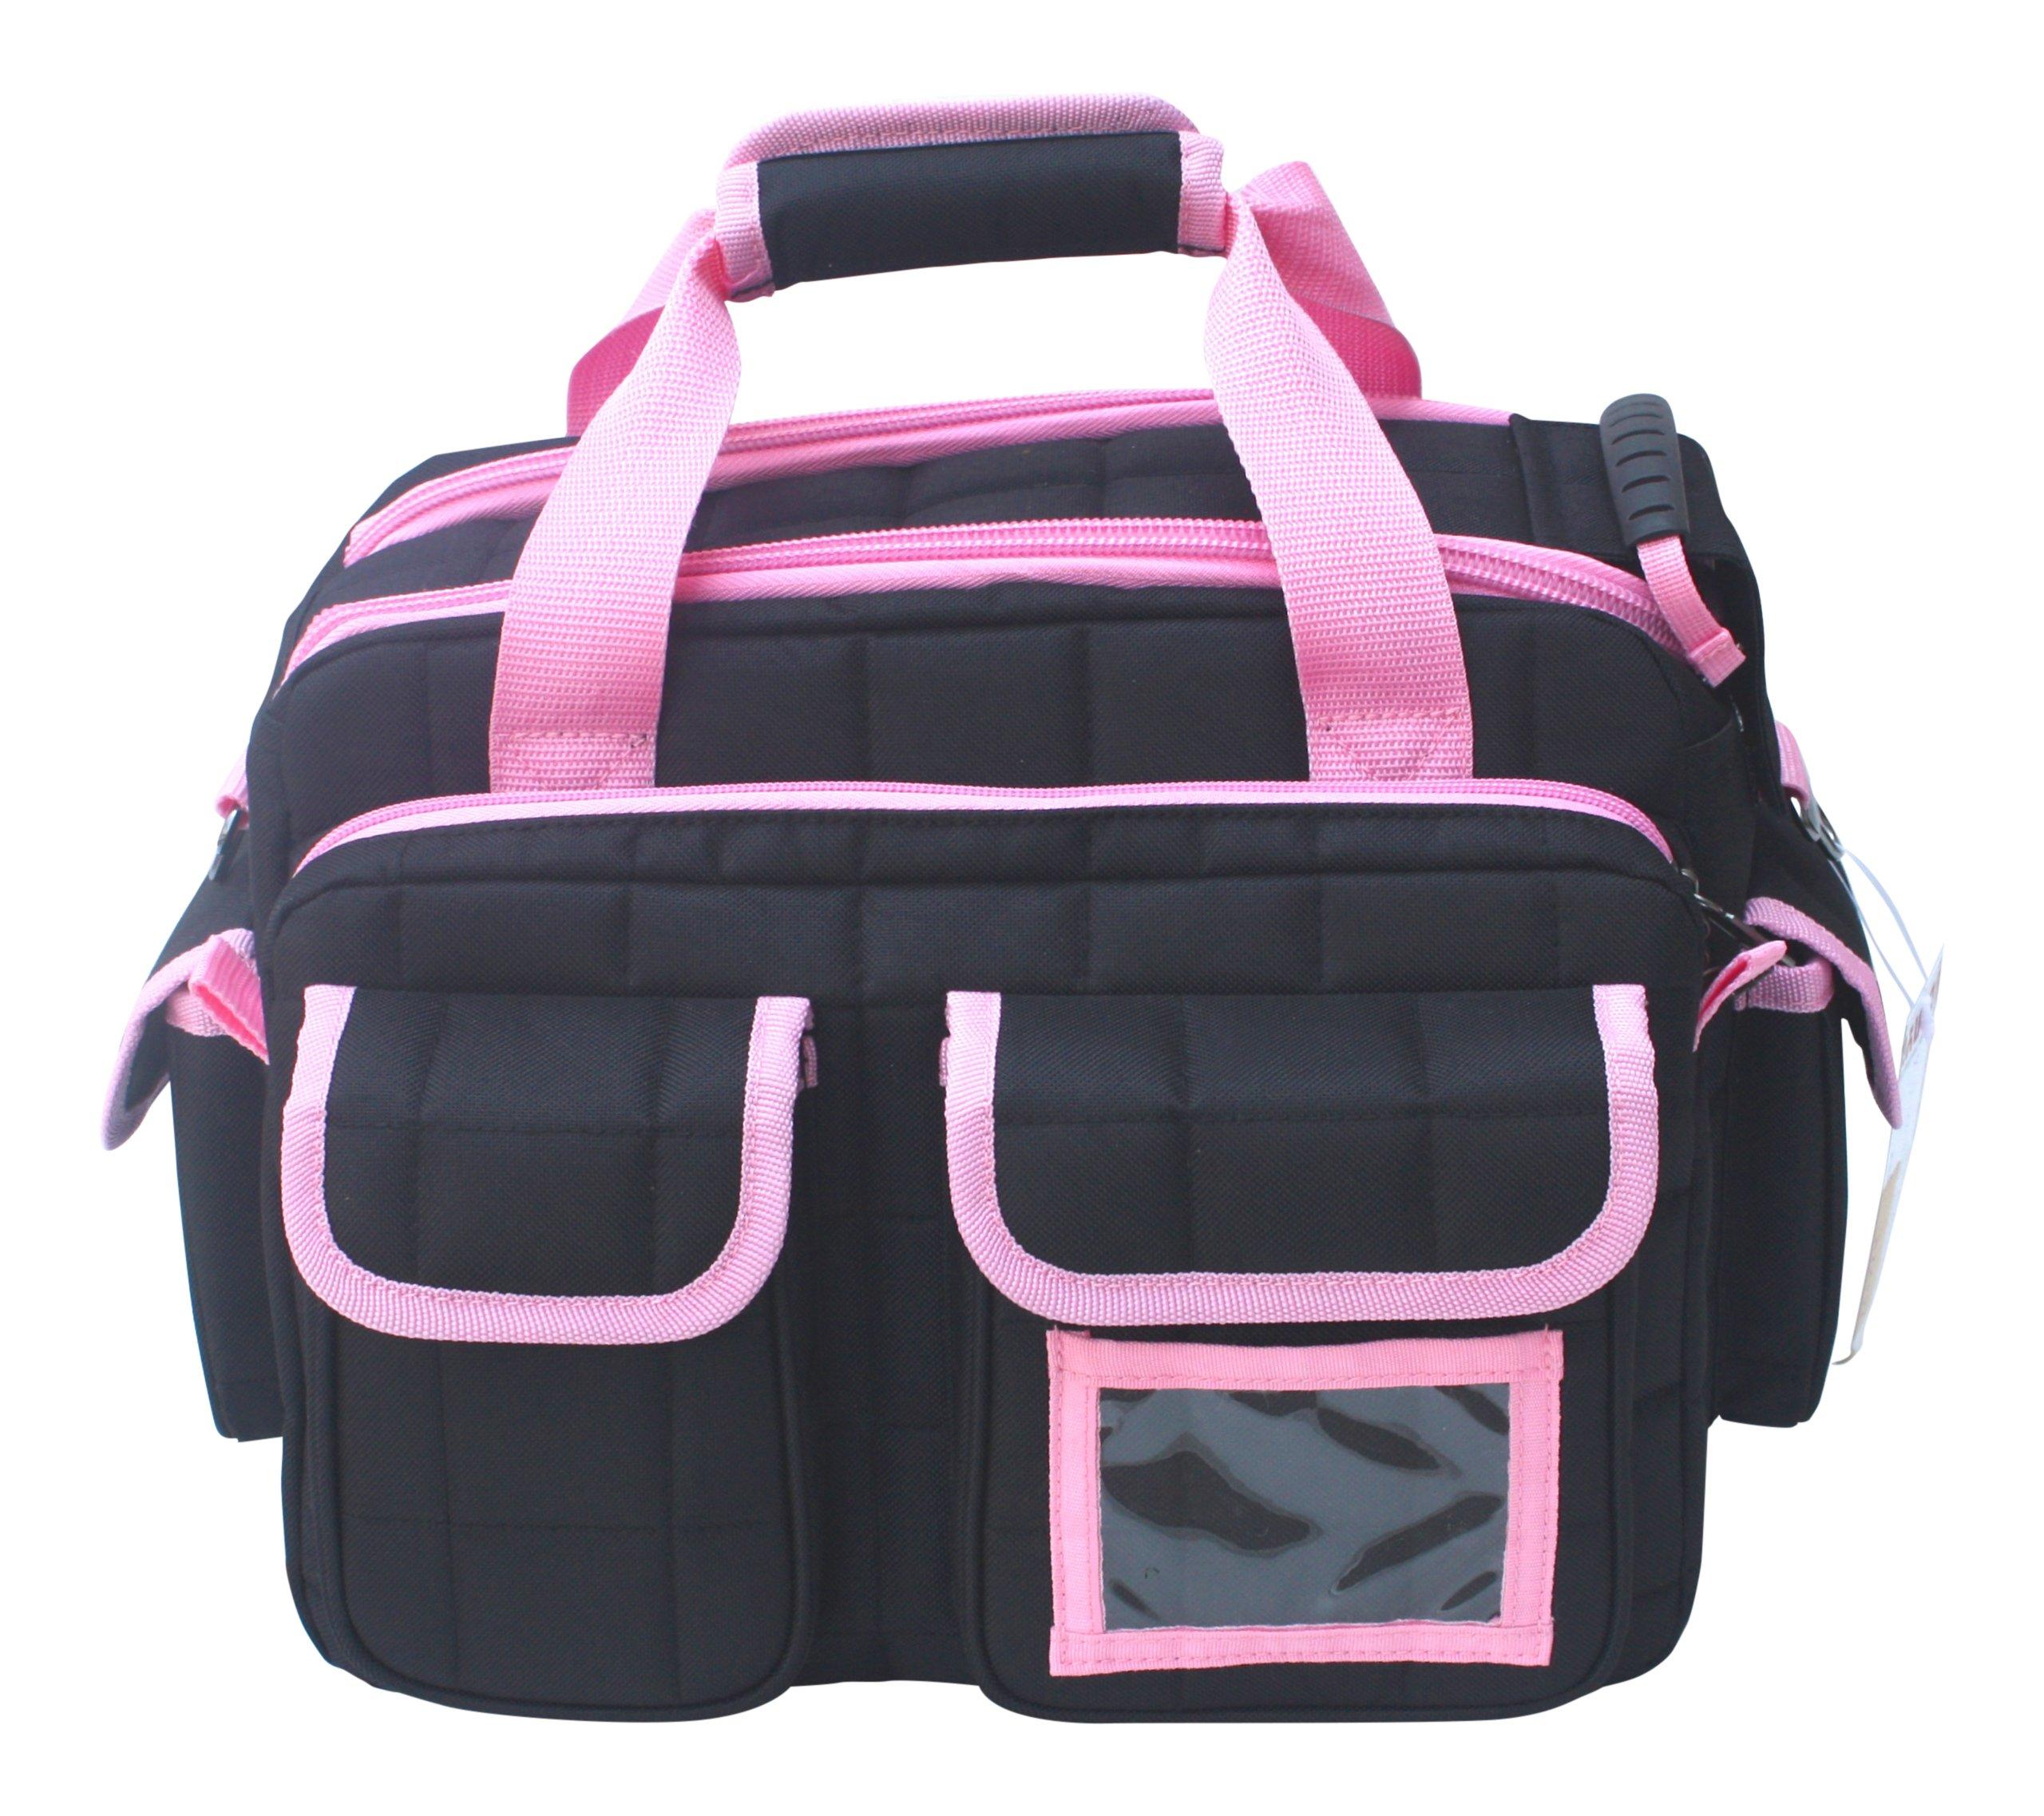 Explorer Tactical 12 Pistol Padded Gun and Gear Bag Pink by Explorer